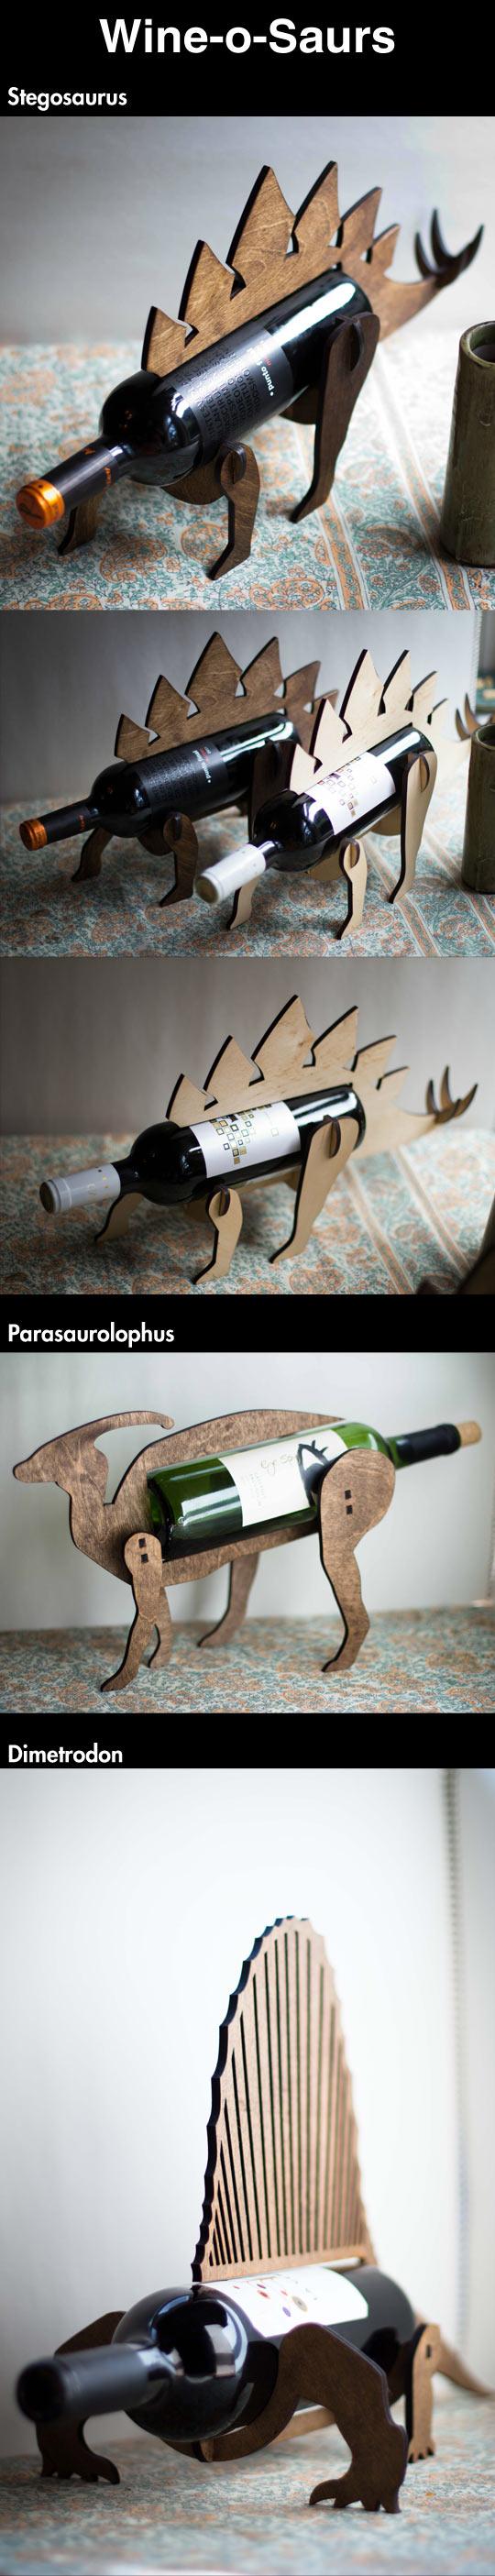 Conventional Wine Racks Are Extinct